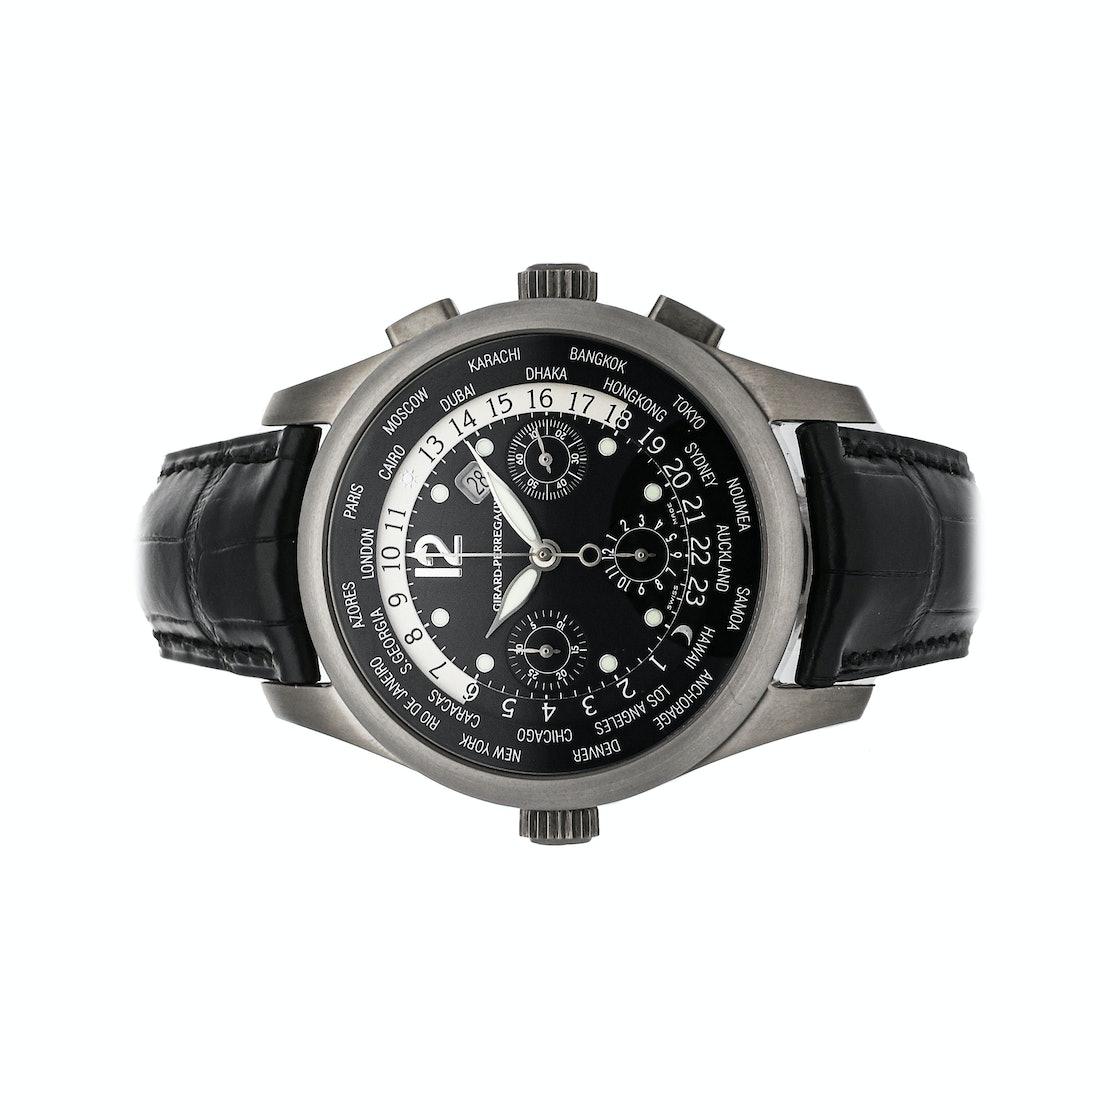 Girard-Perregaux WW.TC Chronograph 49800.0.21.6046